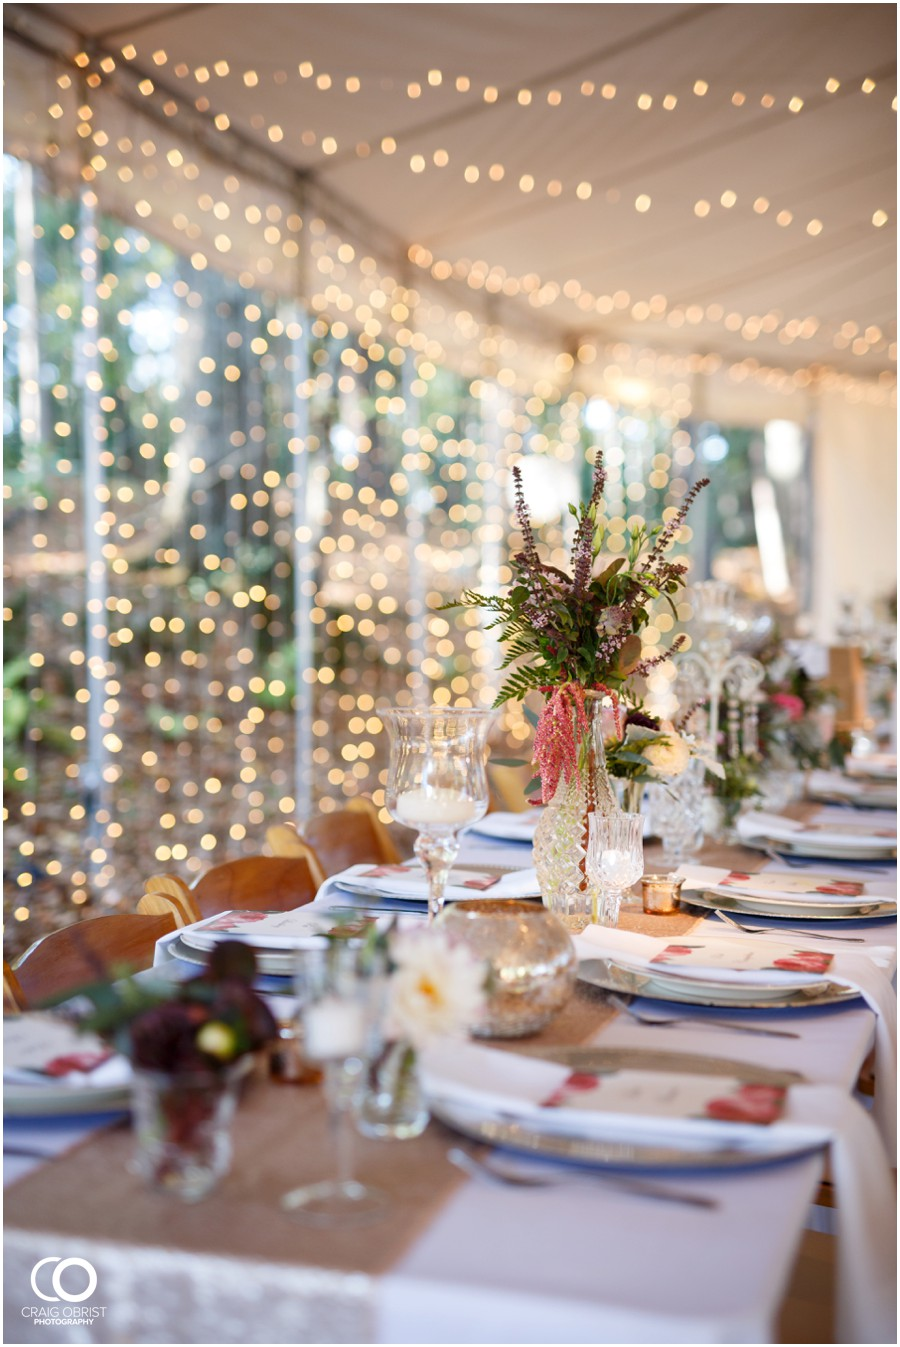 Dunaway gardens Wedding Fairytale Disney Portraits_0079.jpg